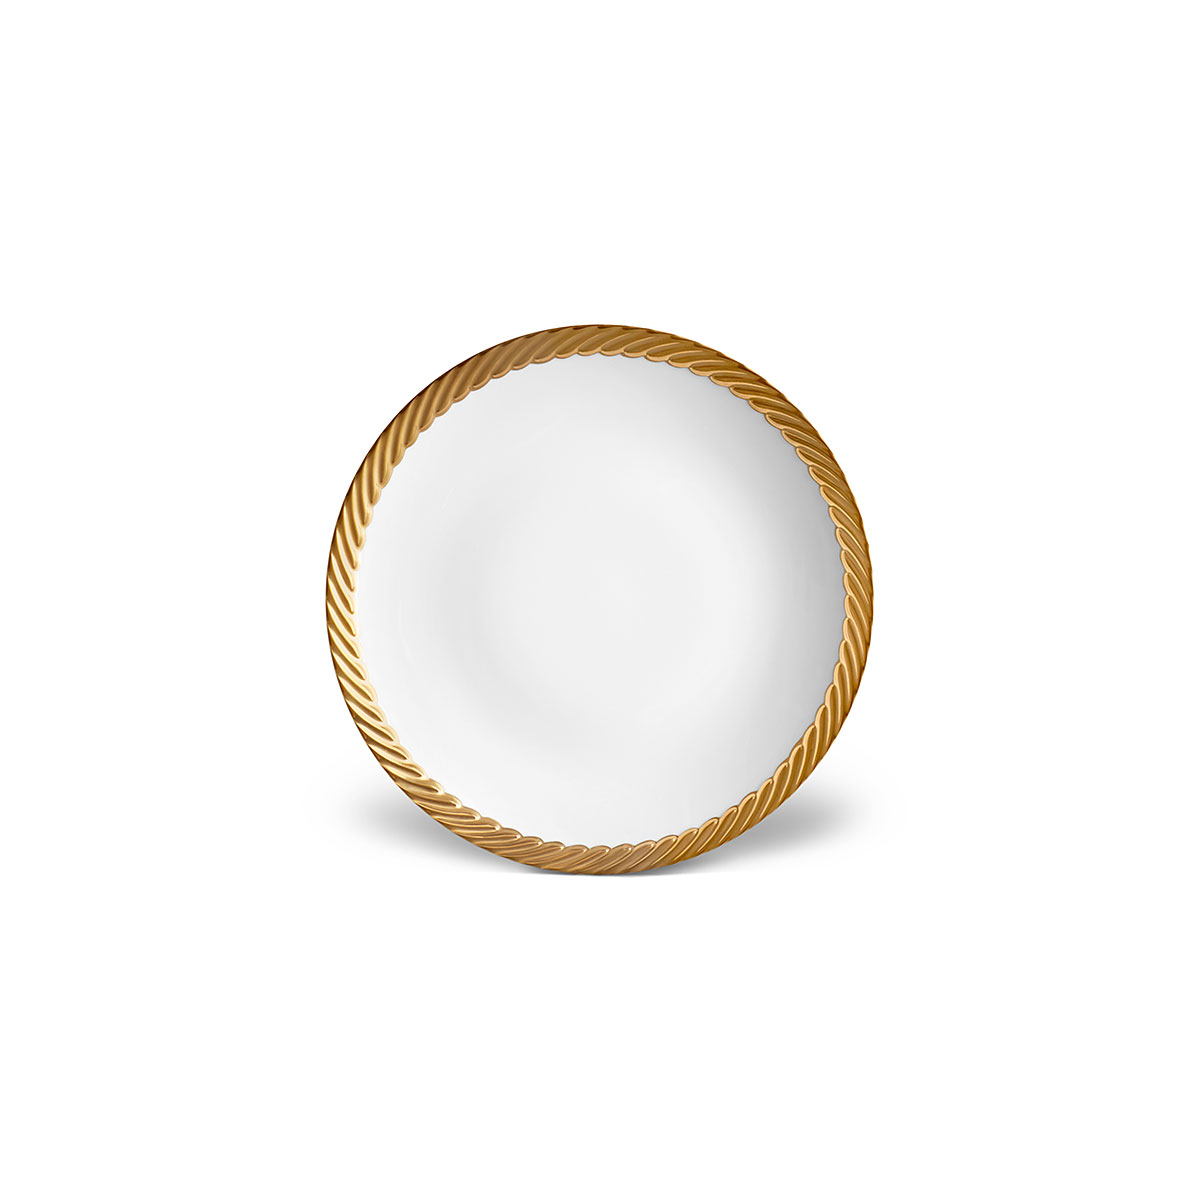 L'Objet I Corde Bread + Butter Plate Gold